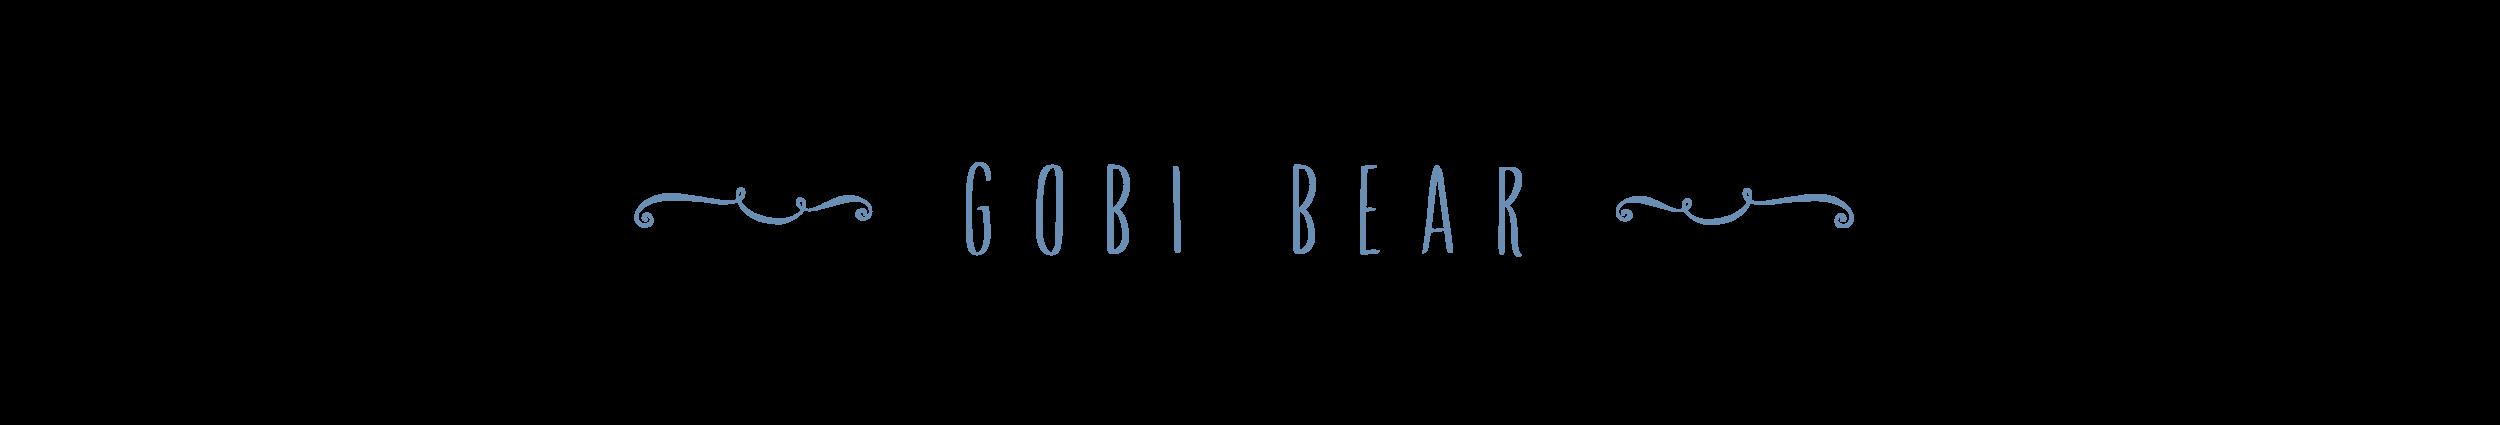 Gobi Bear Banner2-01HRC